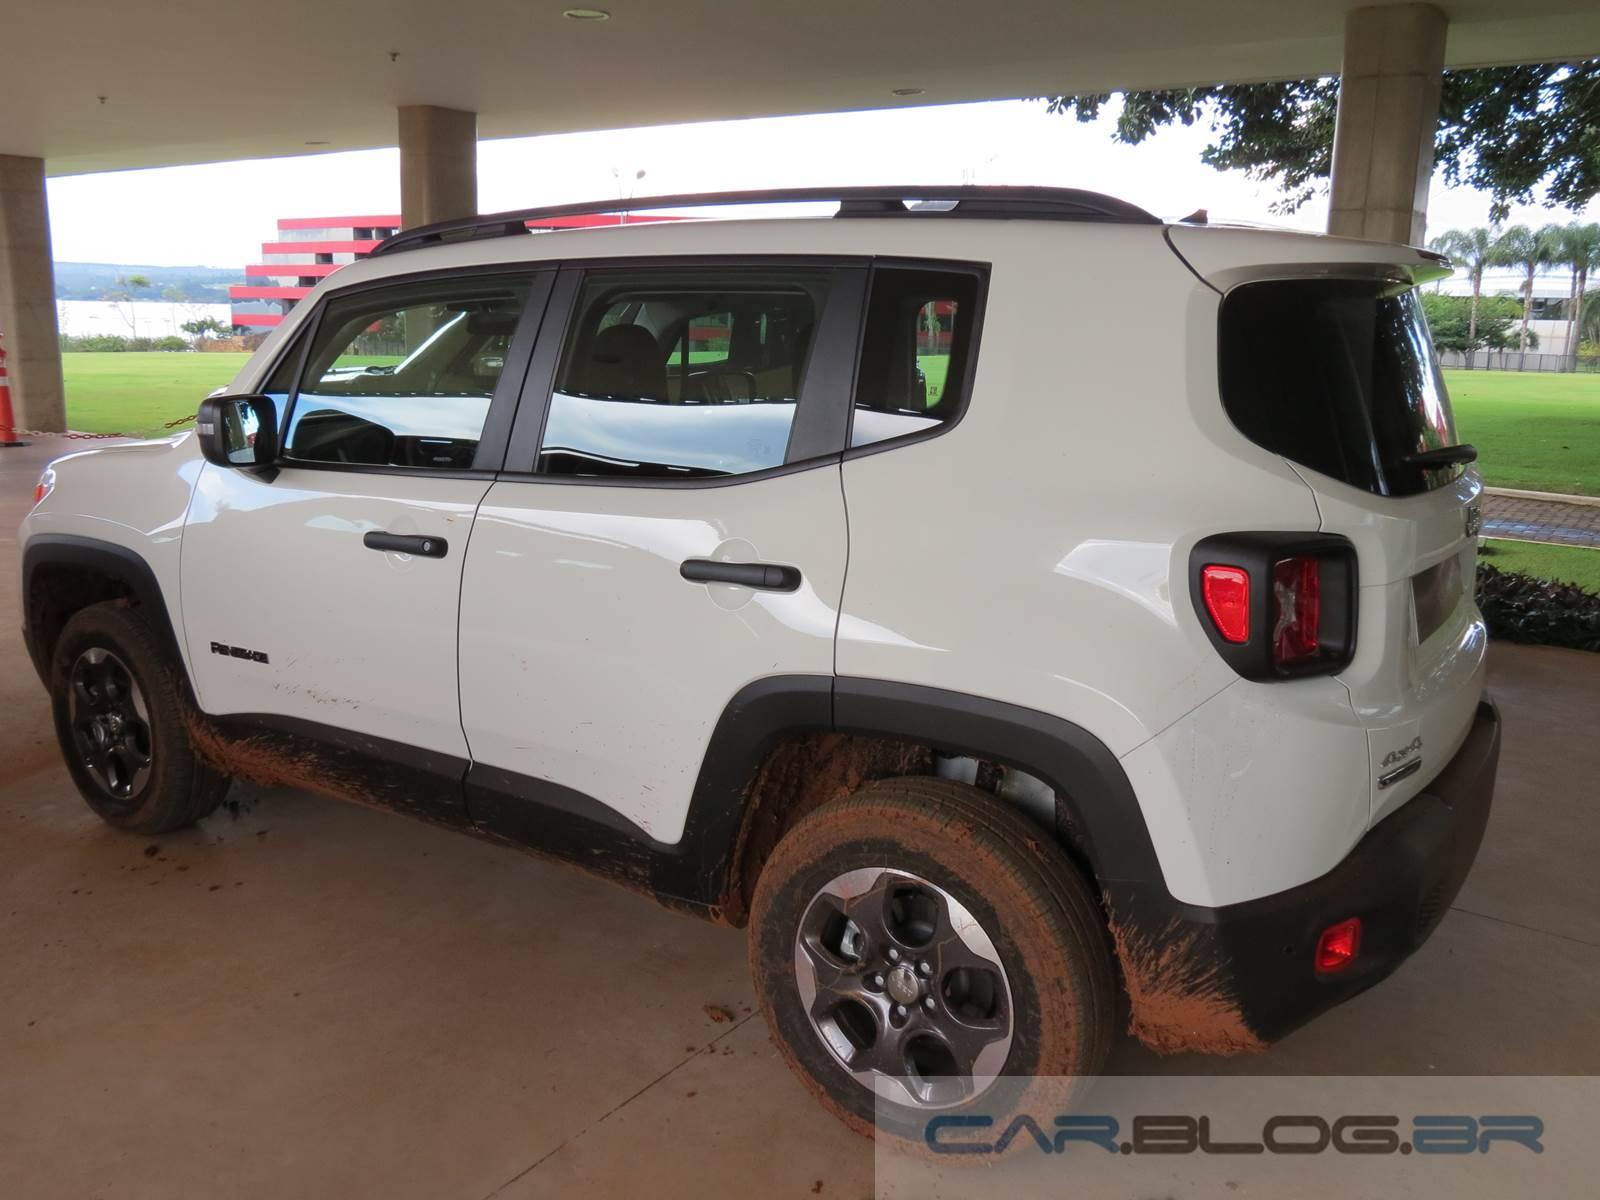 jeep renegade 2 0 diesel v deo com detalhes das vers es car blog br. Black Bedroom Furniture Sets. Home Design Ideas